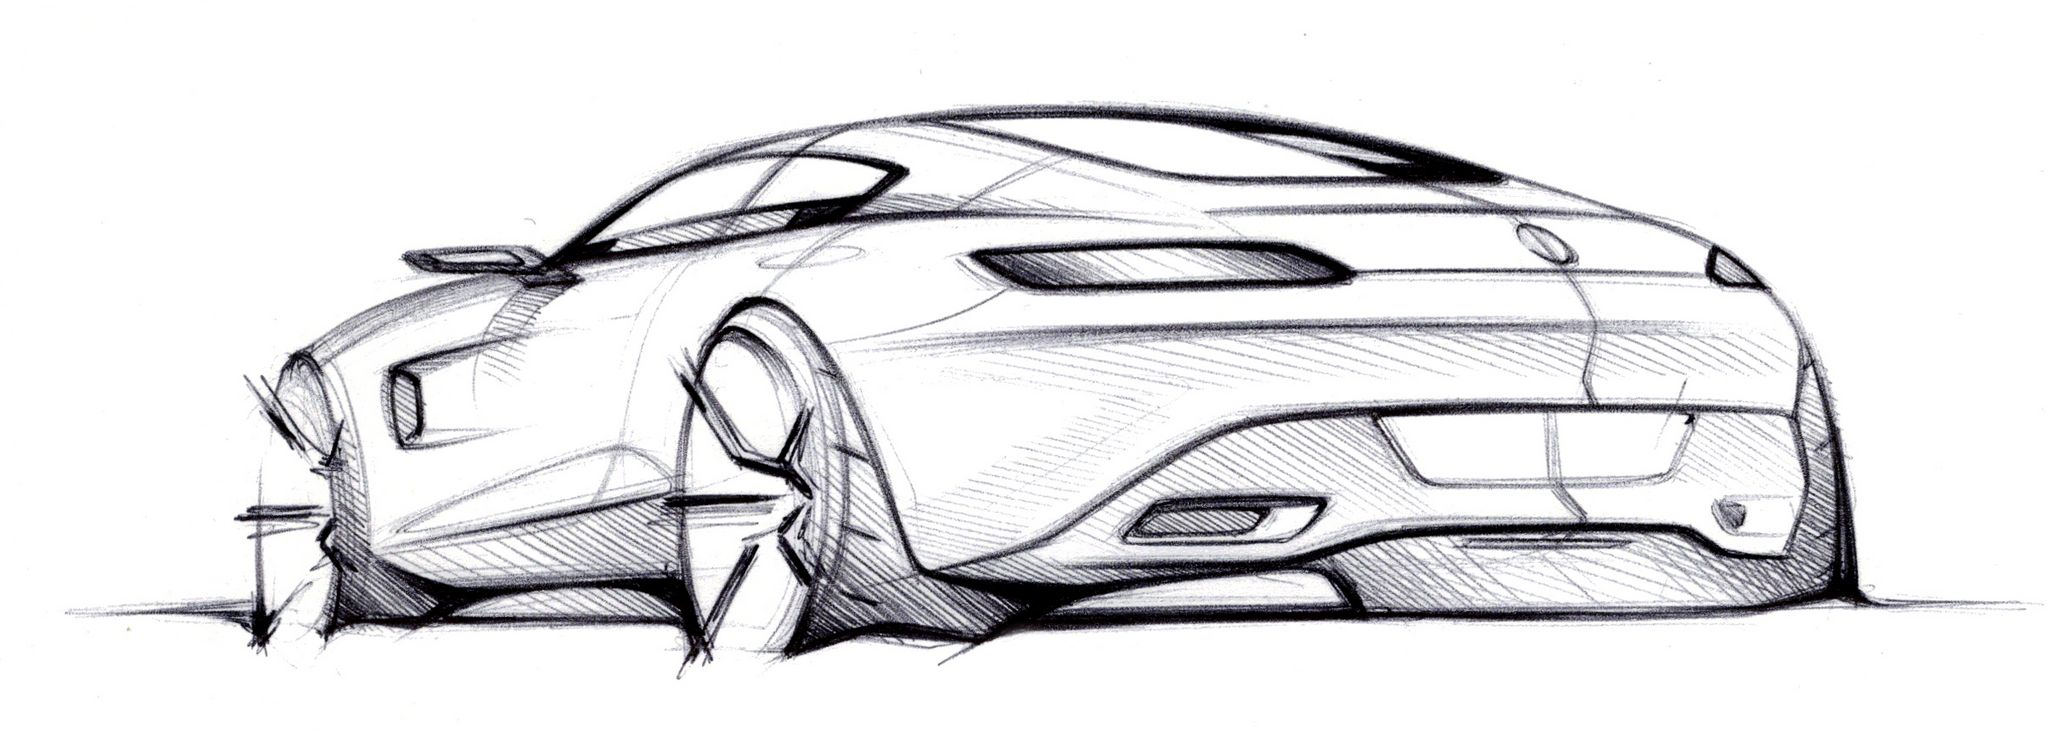 Mercedes-AMG GT (C 190) 2014  New Mercedes-Benz AMG GT  Mercedes AMG GT official sketch rear three quarters